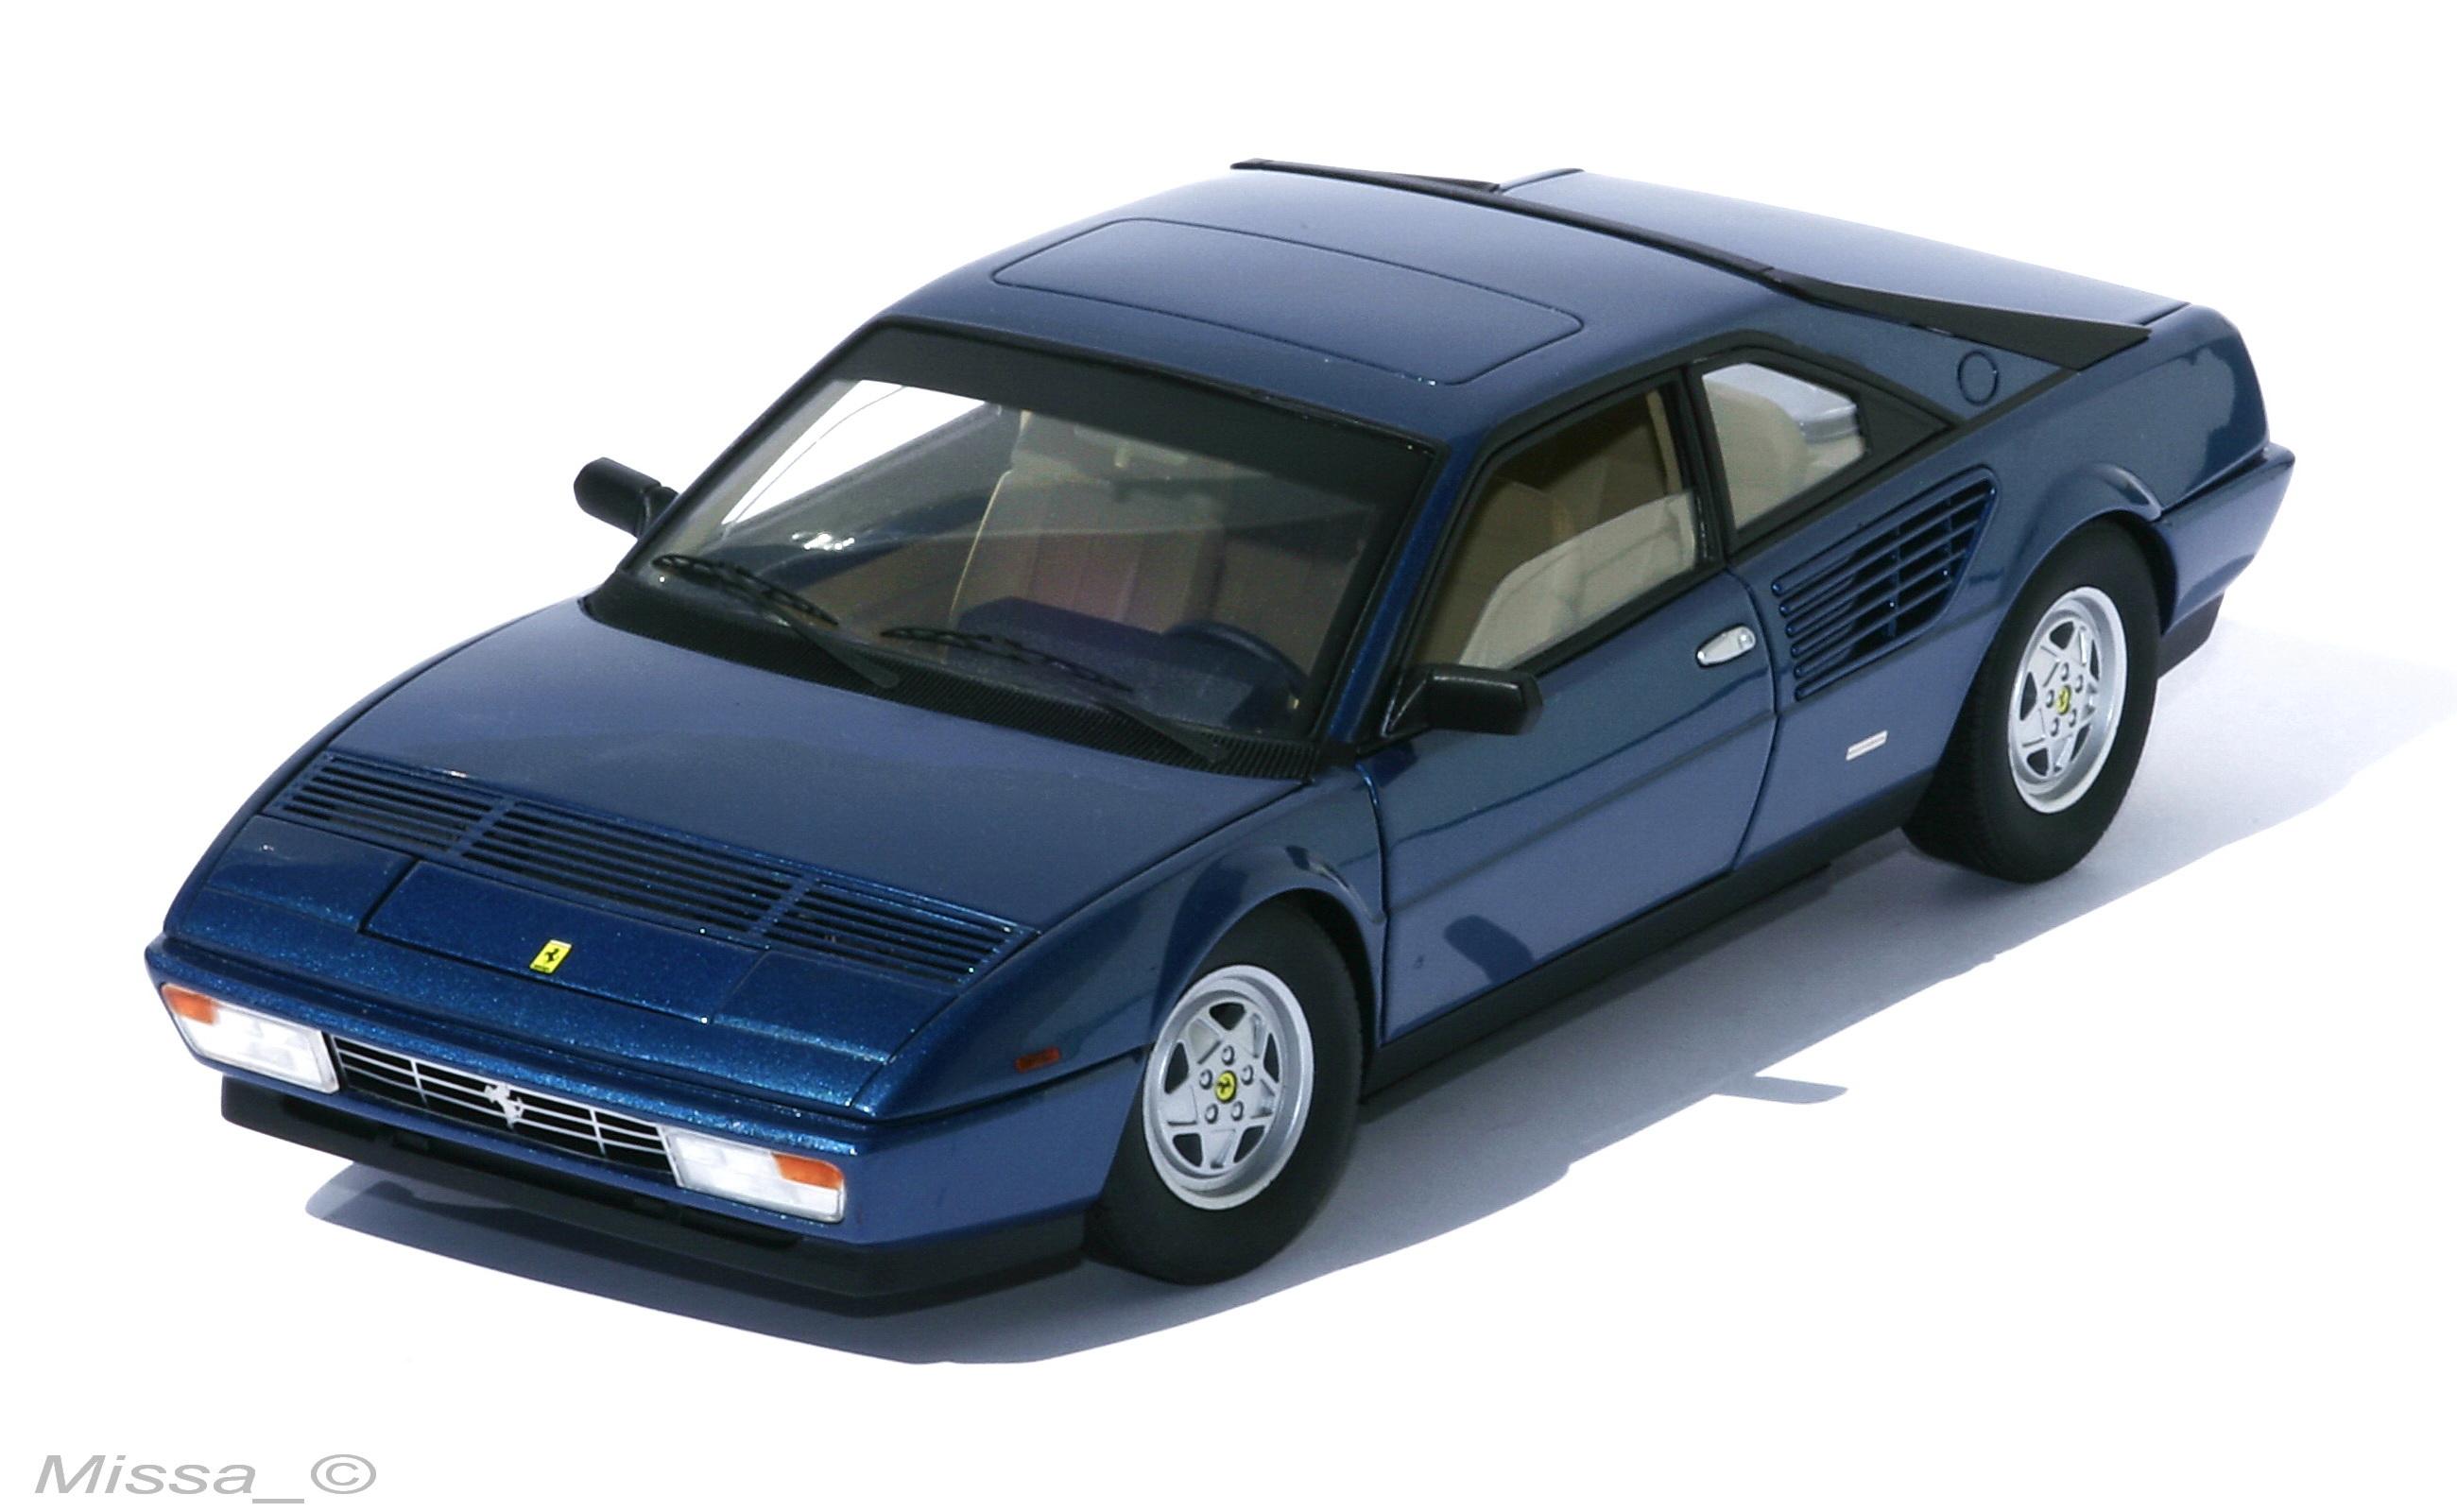 011_elite_ferrari_monq2kch Fabulous Ferrari Mondial 8 Super Elite Cars Trend